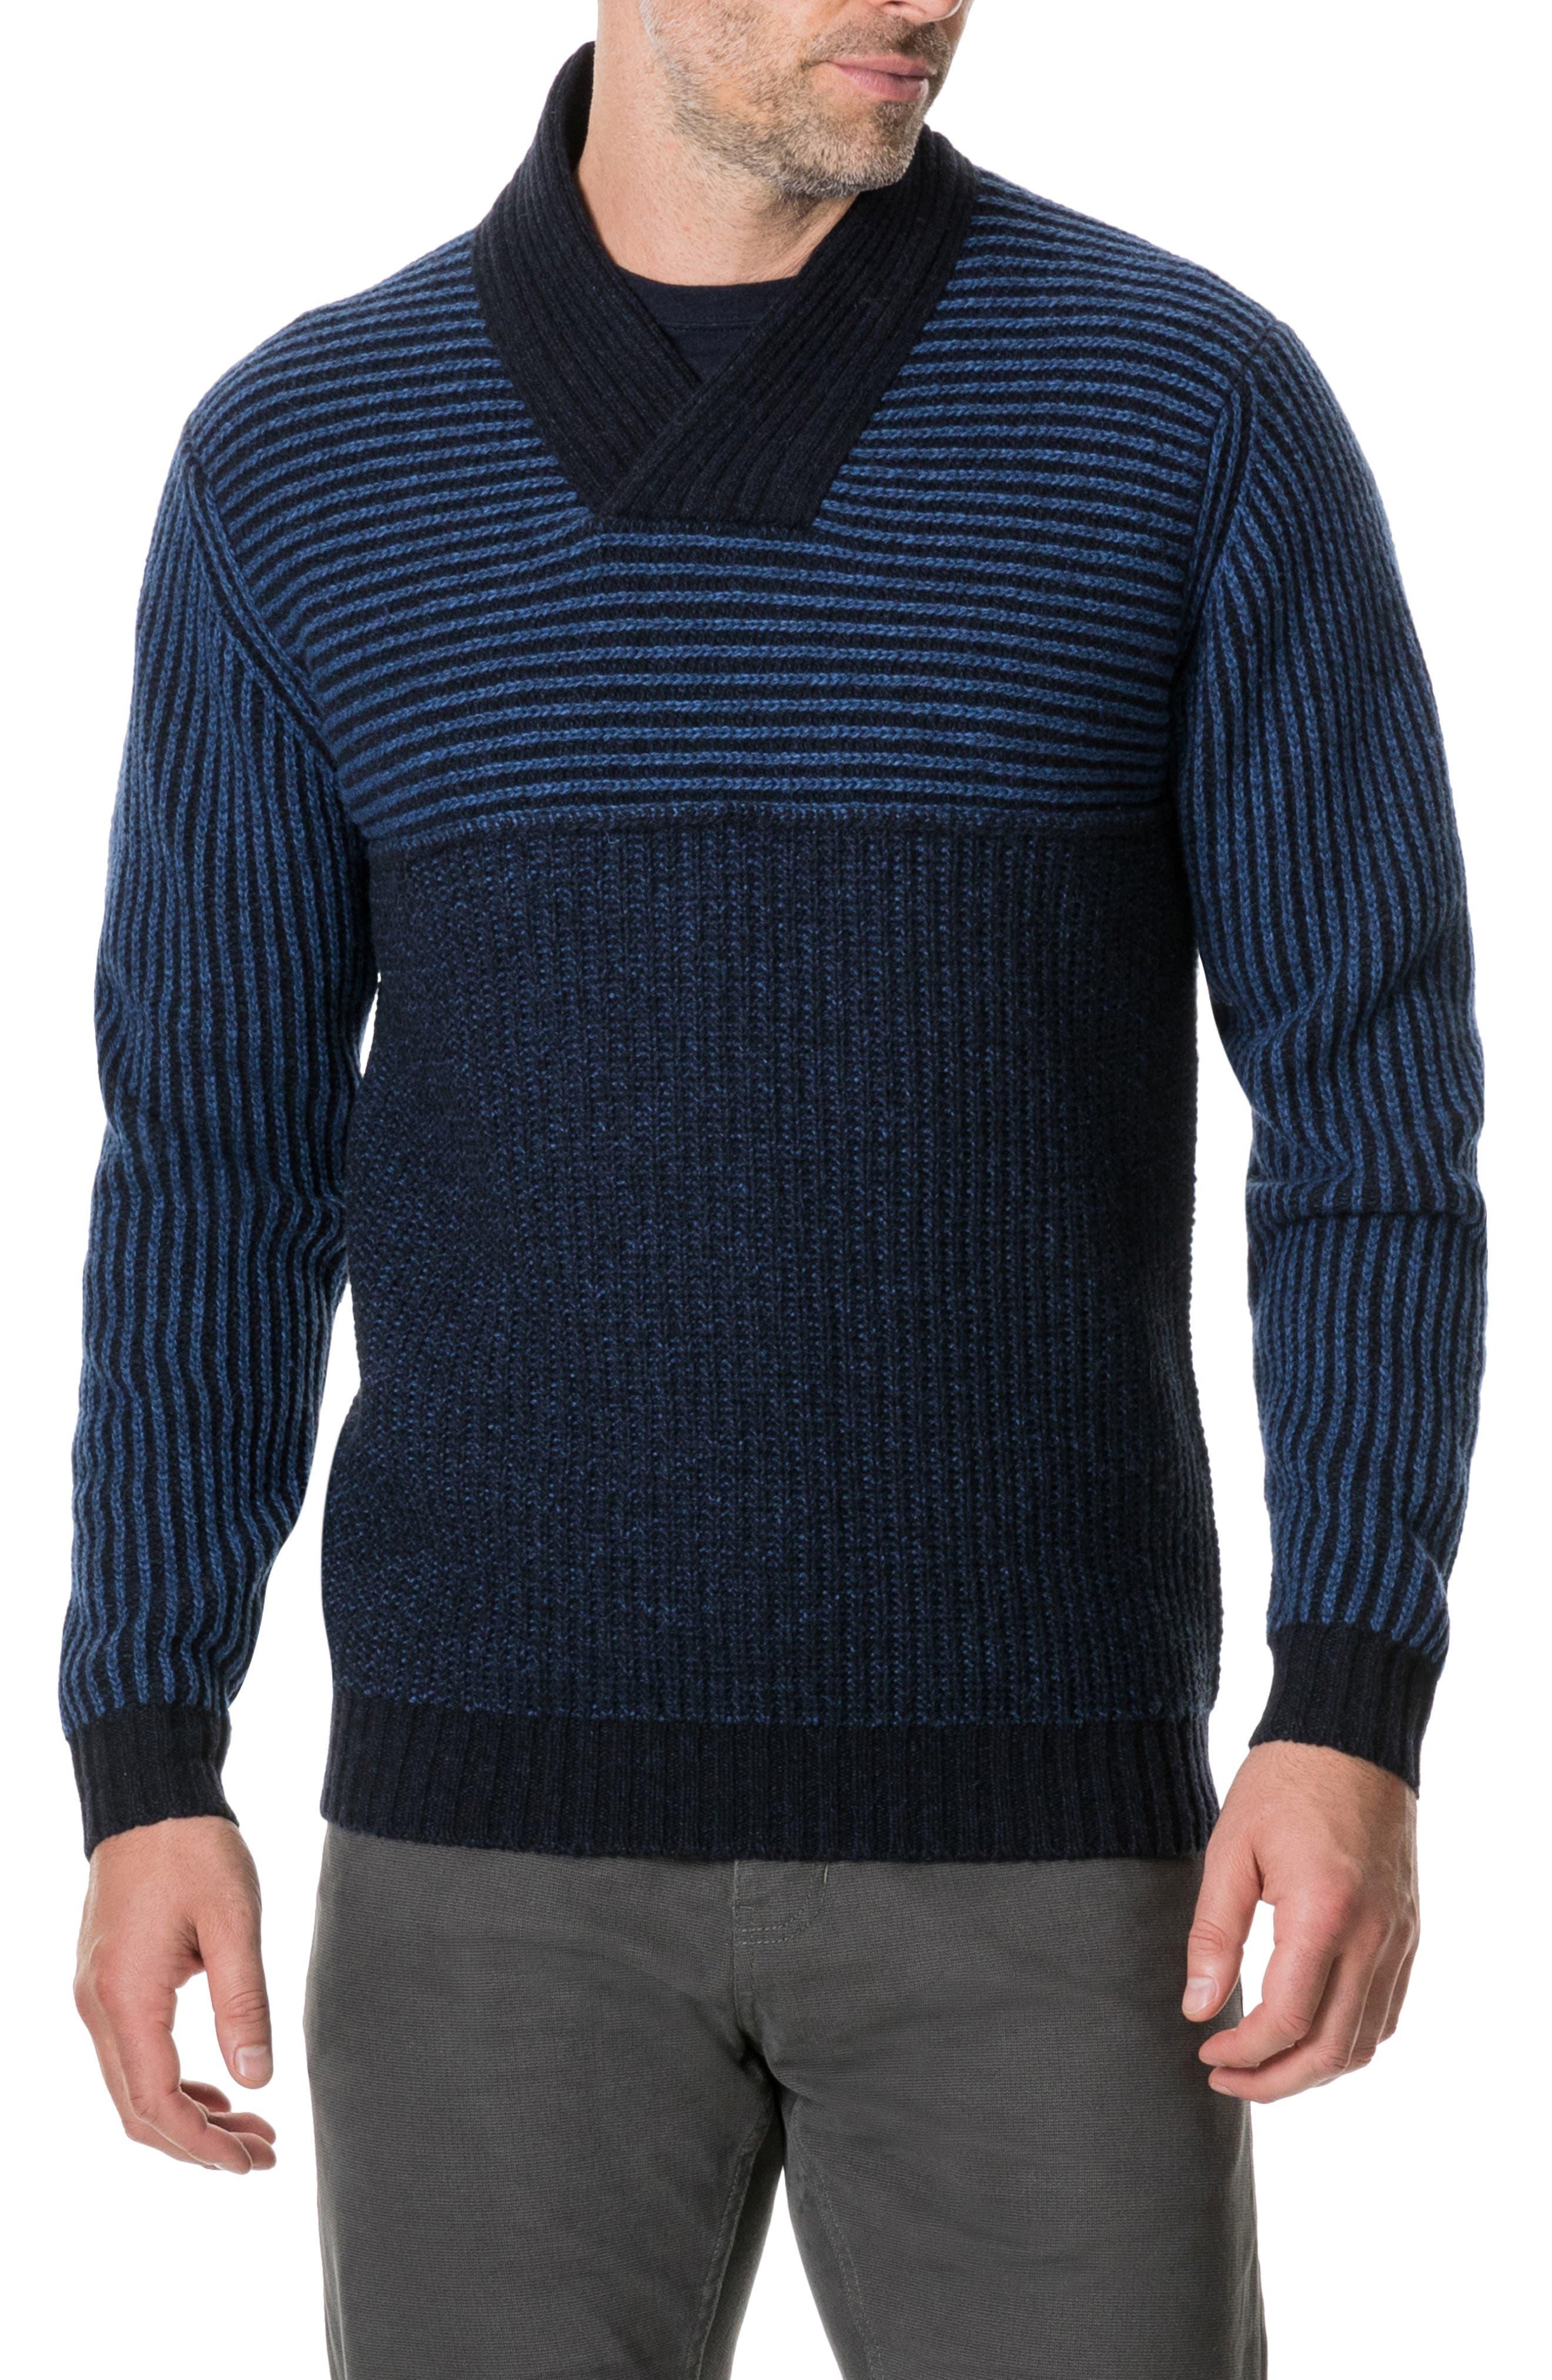 Image of RODD AND GUNN Ettrick Knit Regular Sweater